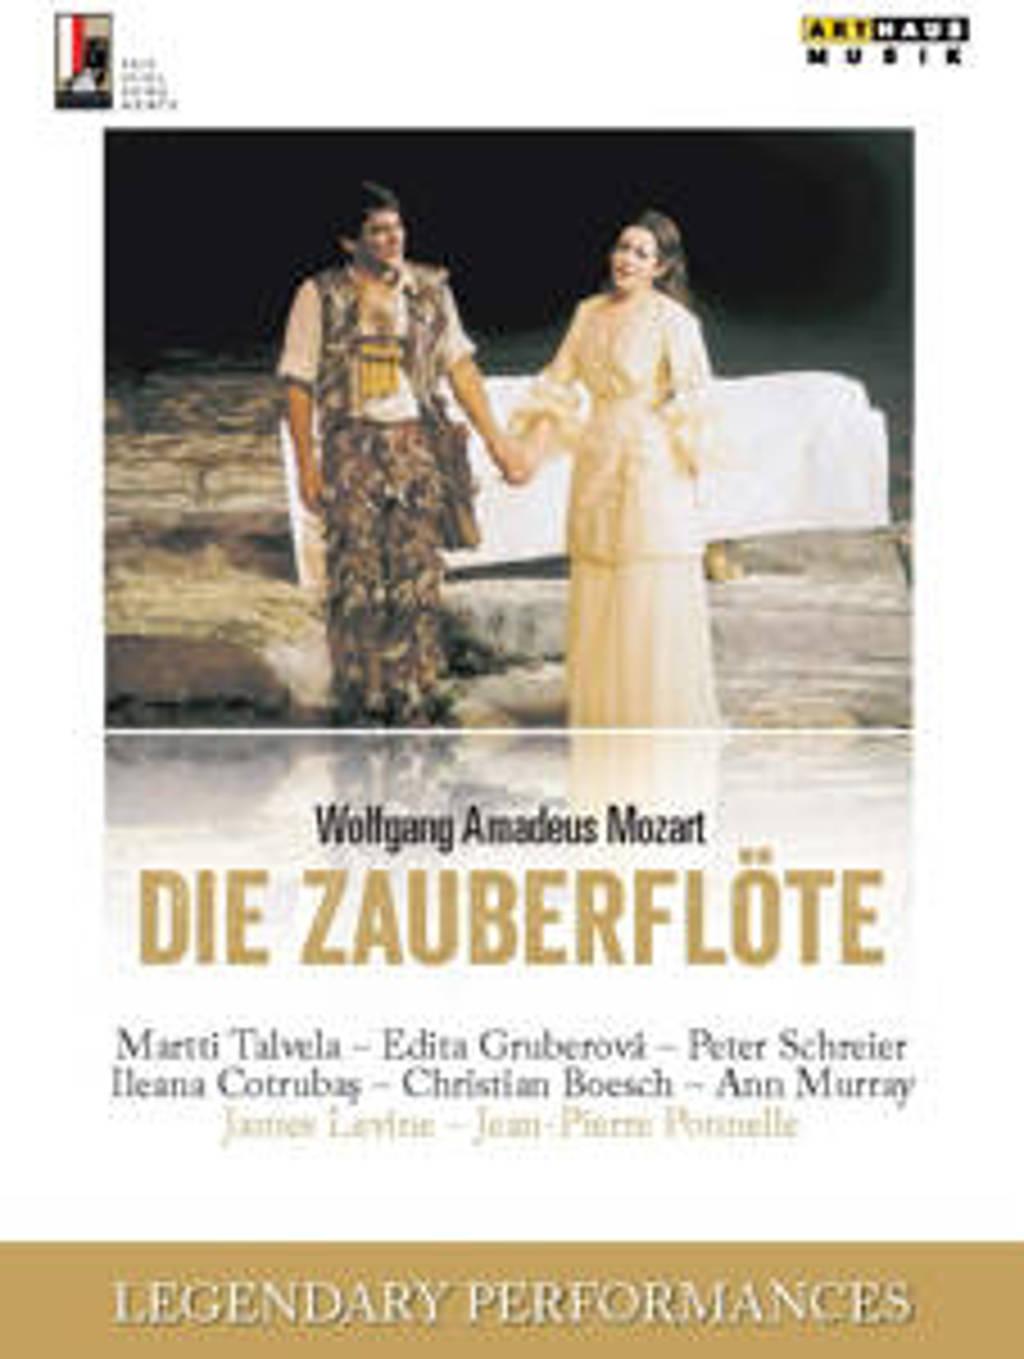 Gruberova,Talvela,Schreier - Legendary Performances Mozart The M (DVD)